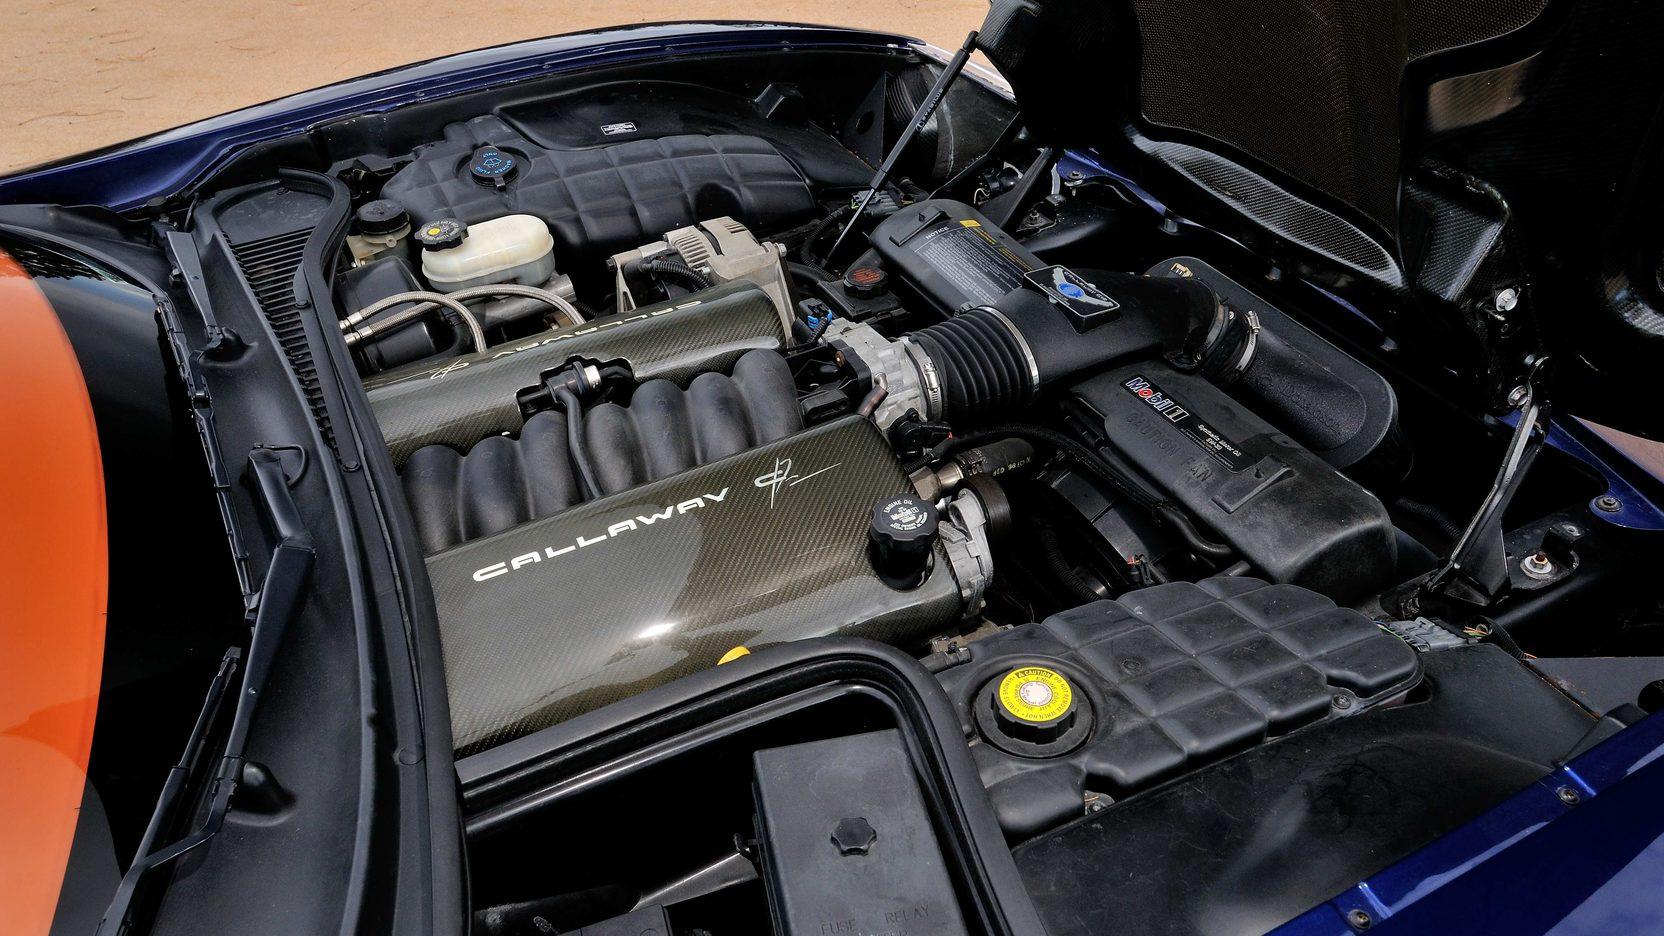 1997 Callaway C12 engine